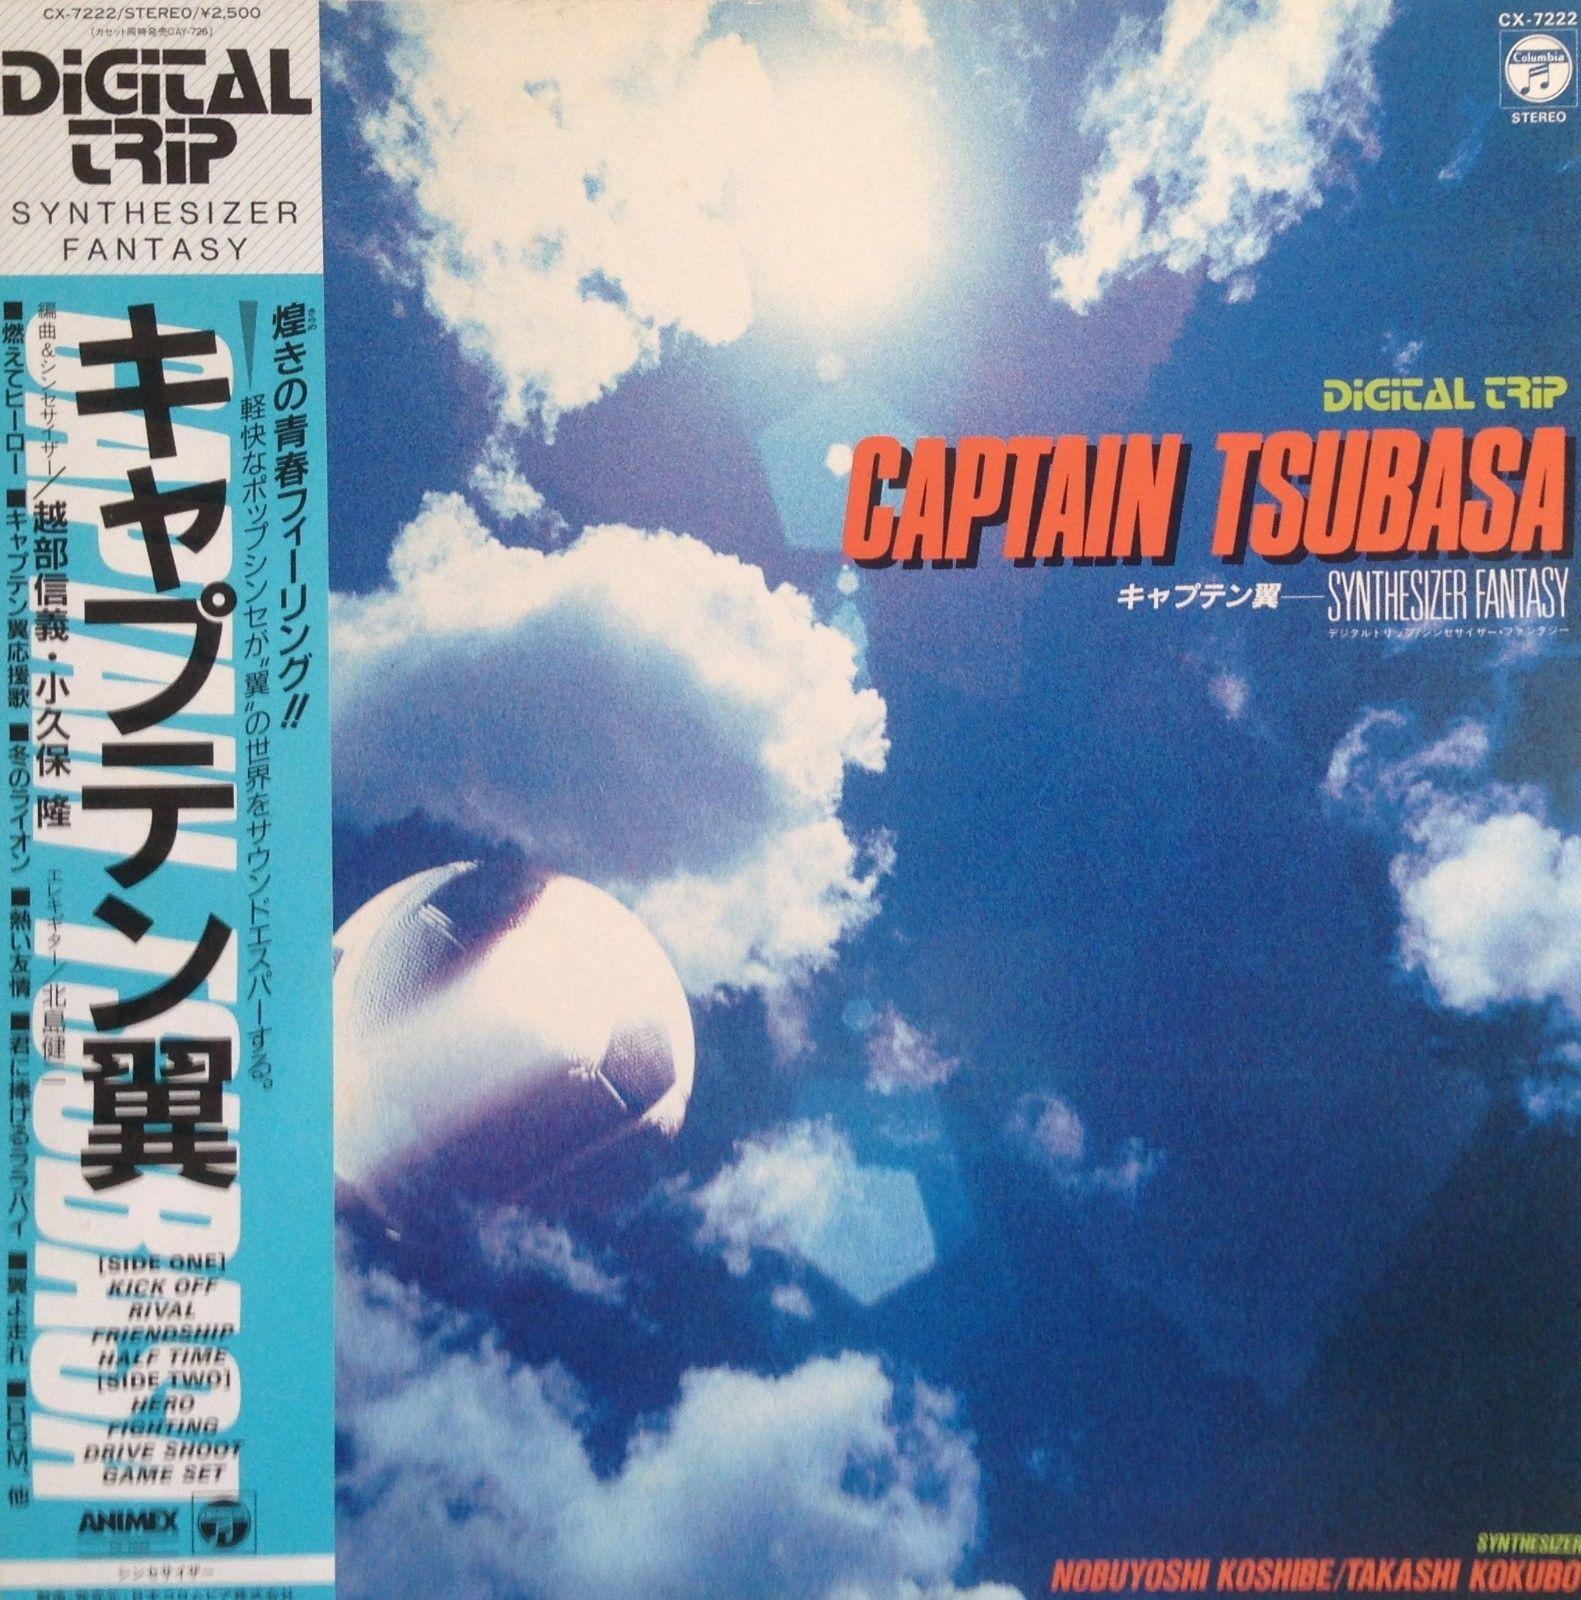 Digital Trip: Synthesizer Fantasy - Captain Tsubasa